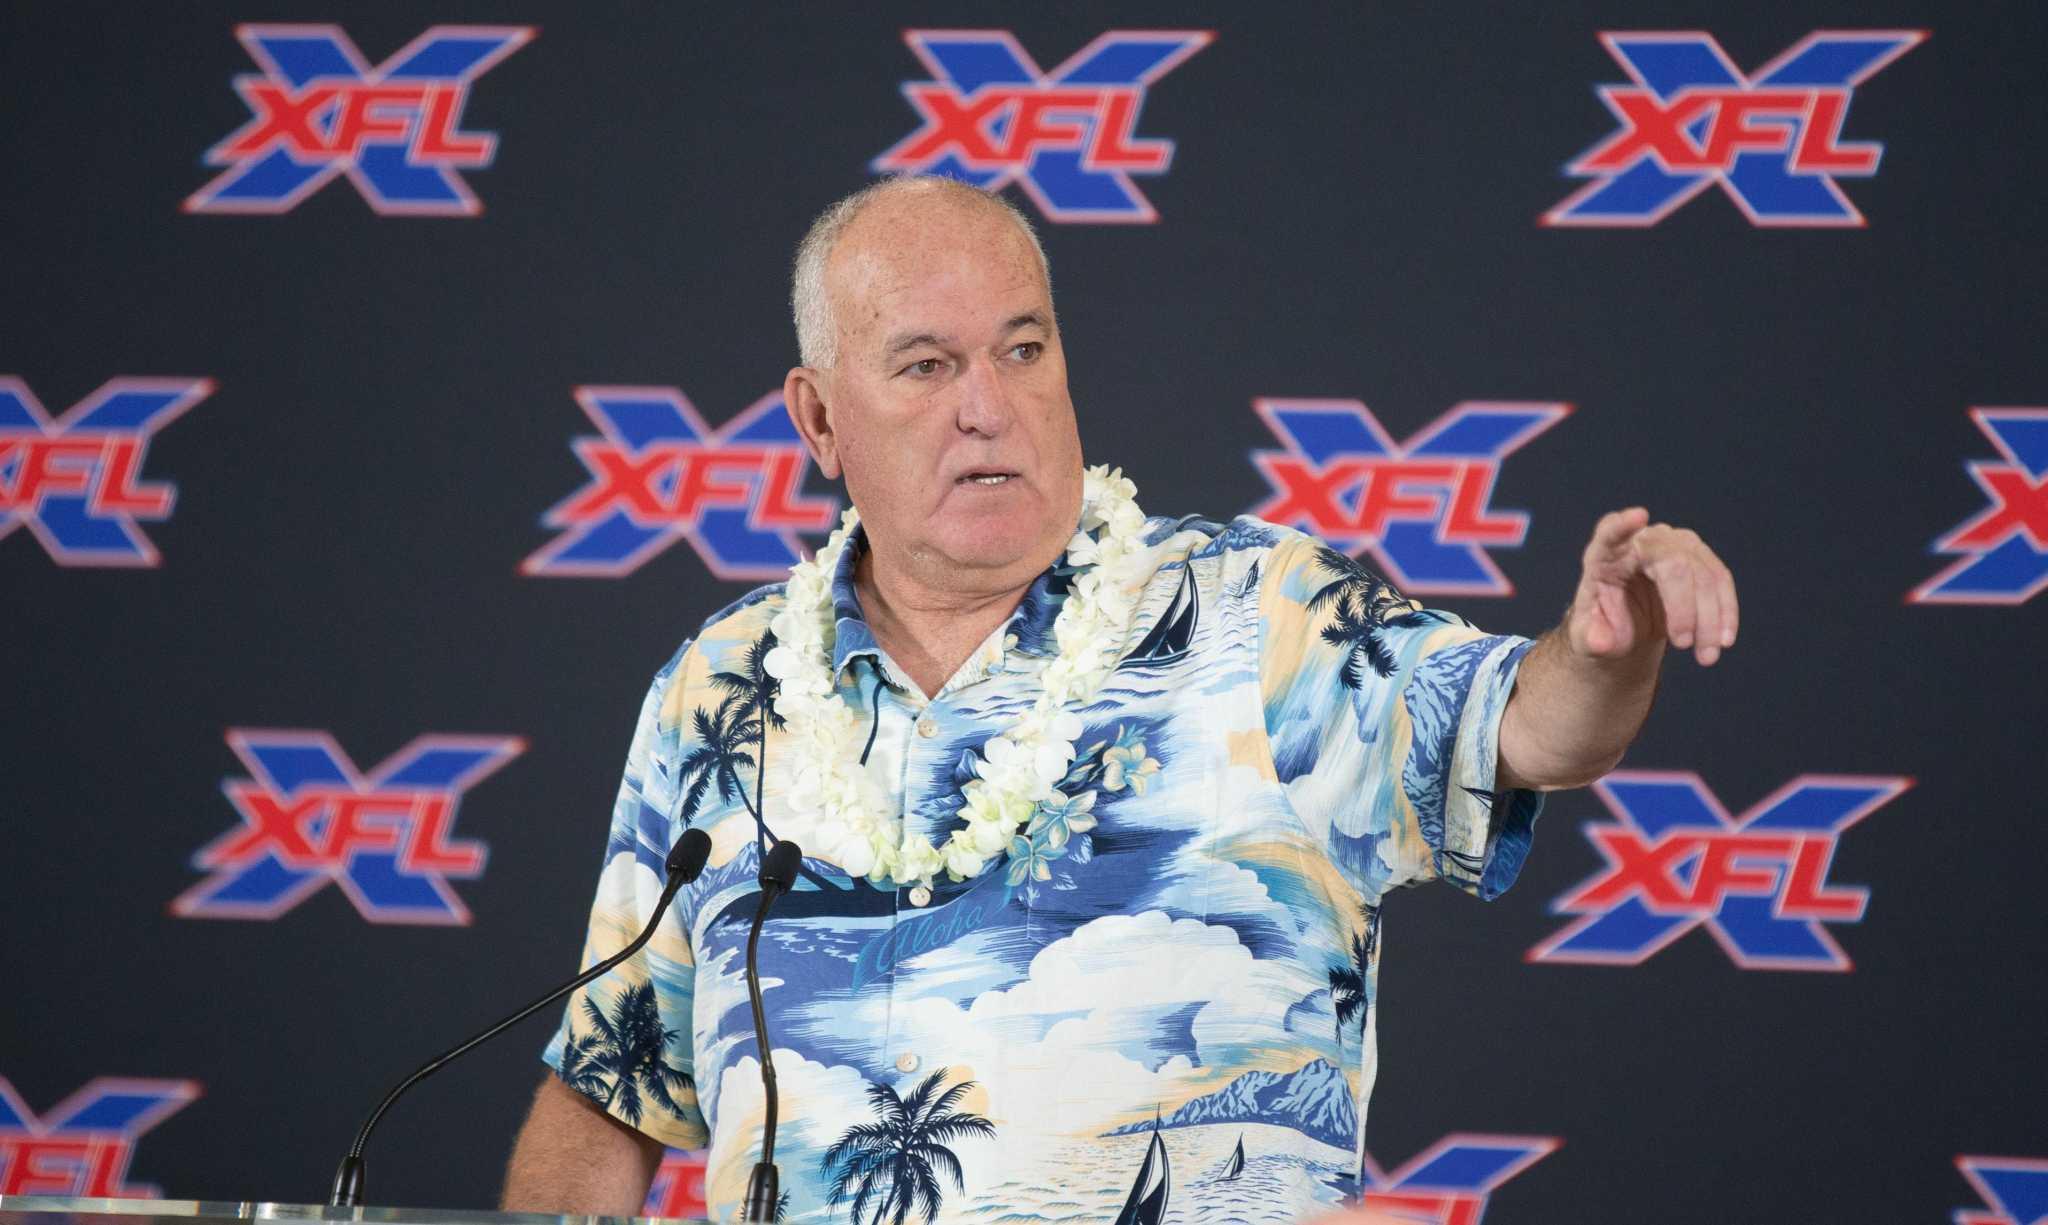 Solomon: Don't scoff at XFL's innovations